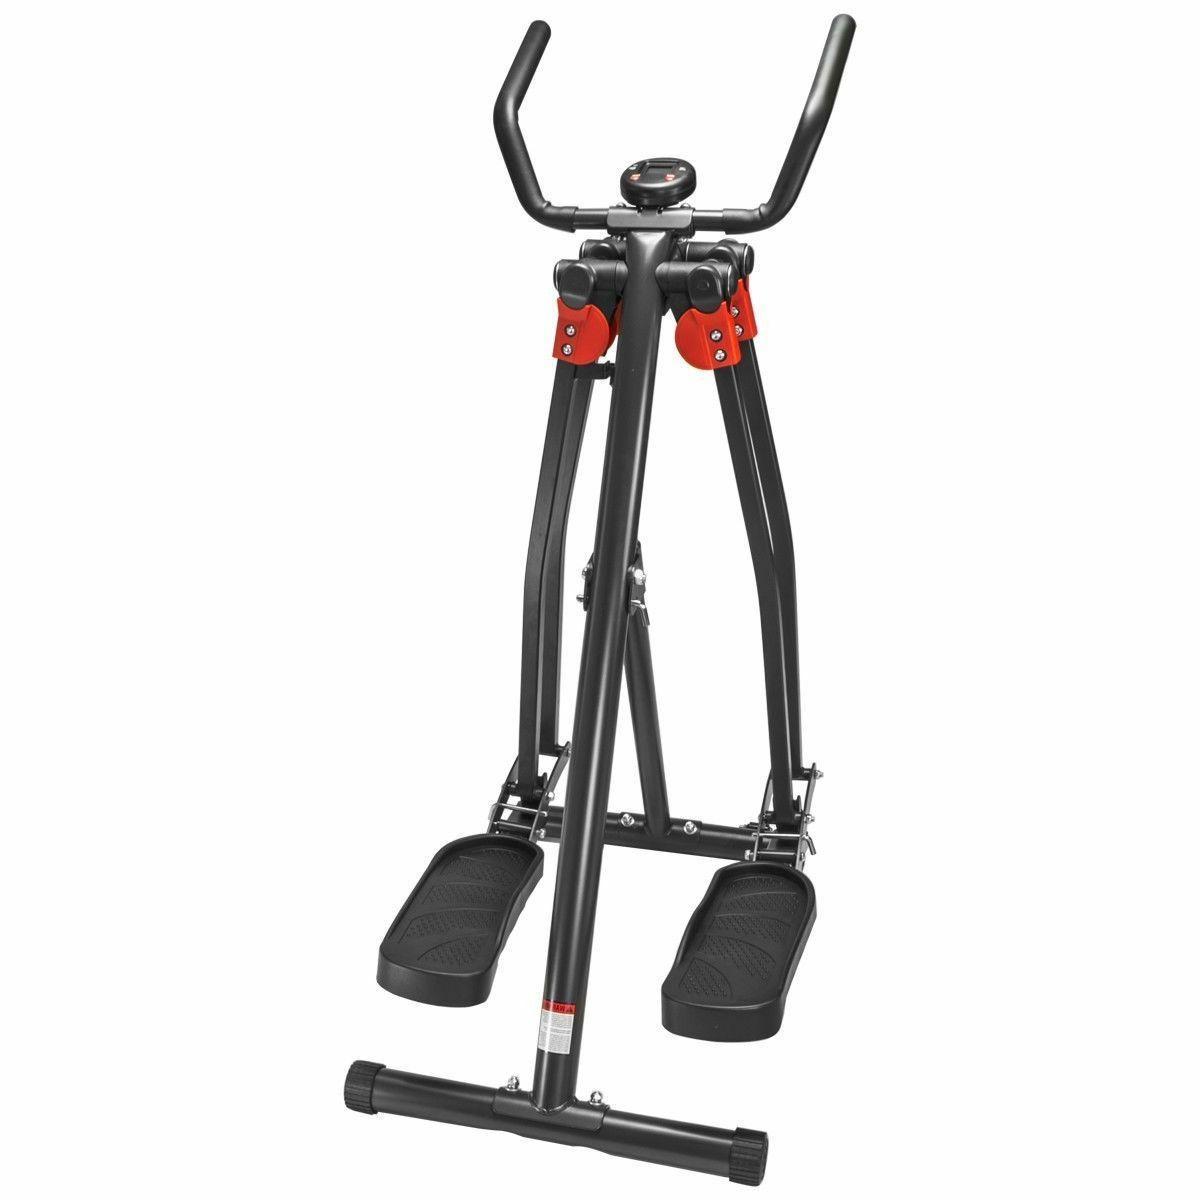 Fitness Equipment Cardio Air Walker